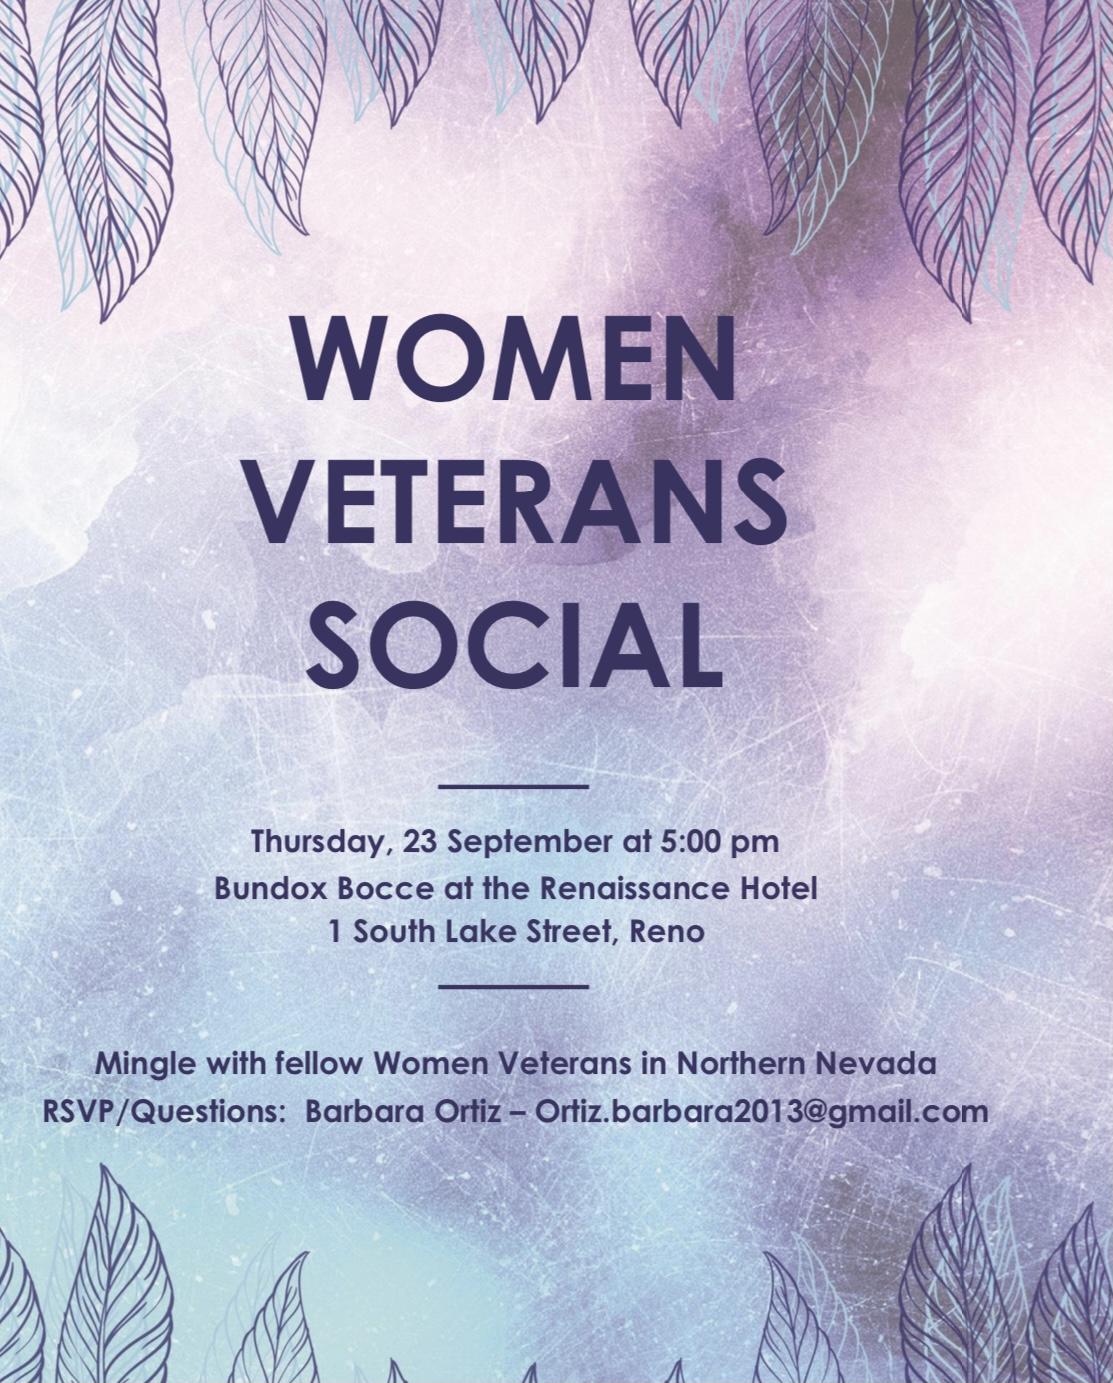 WOMEN VETERANS SOCIAL